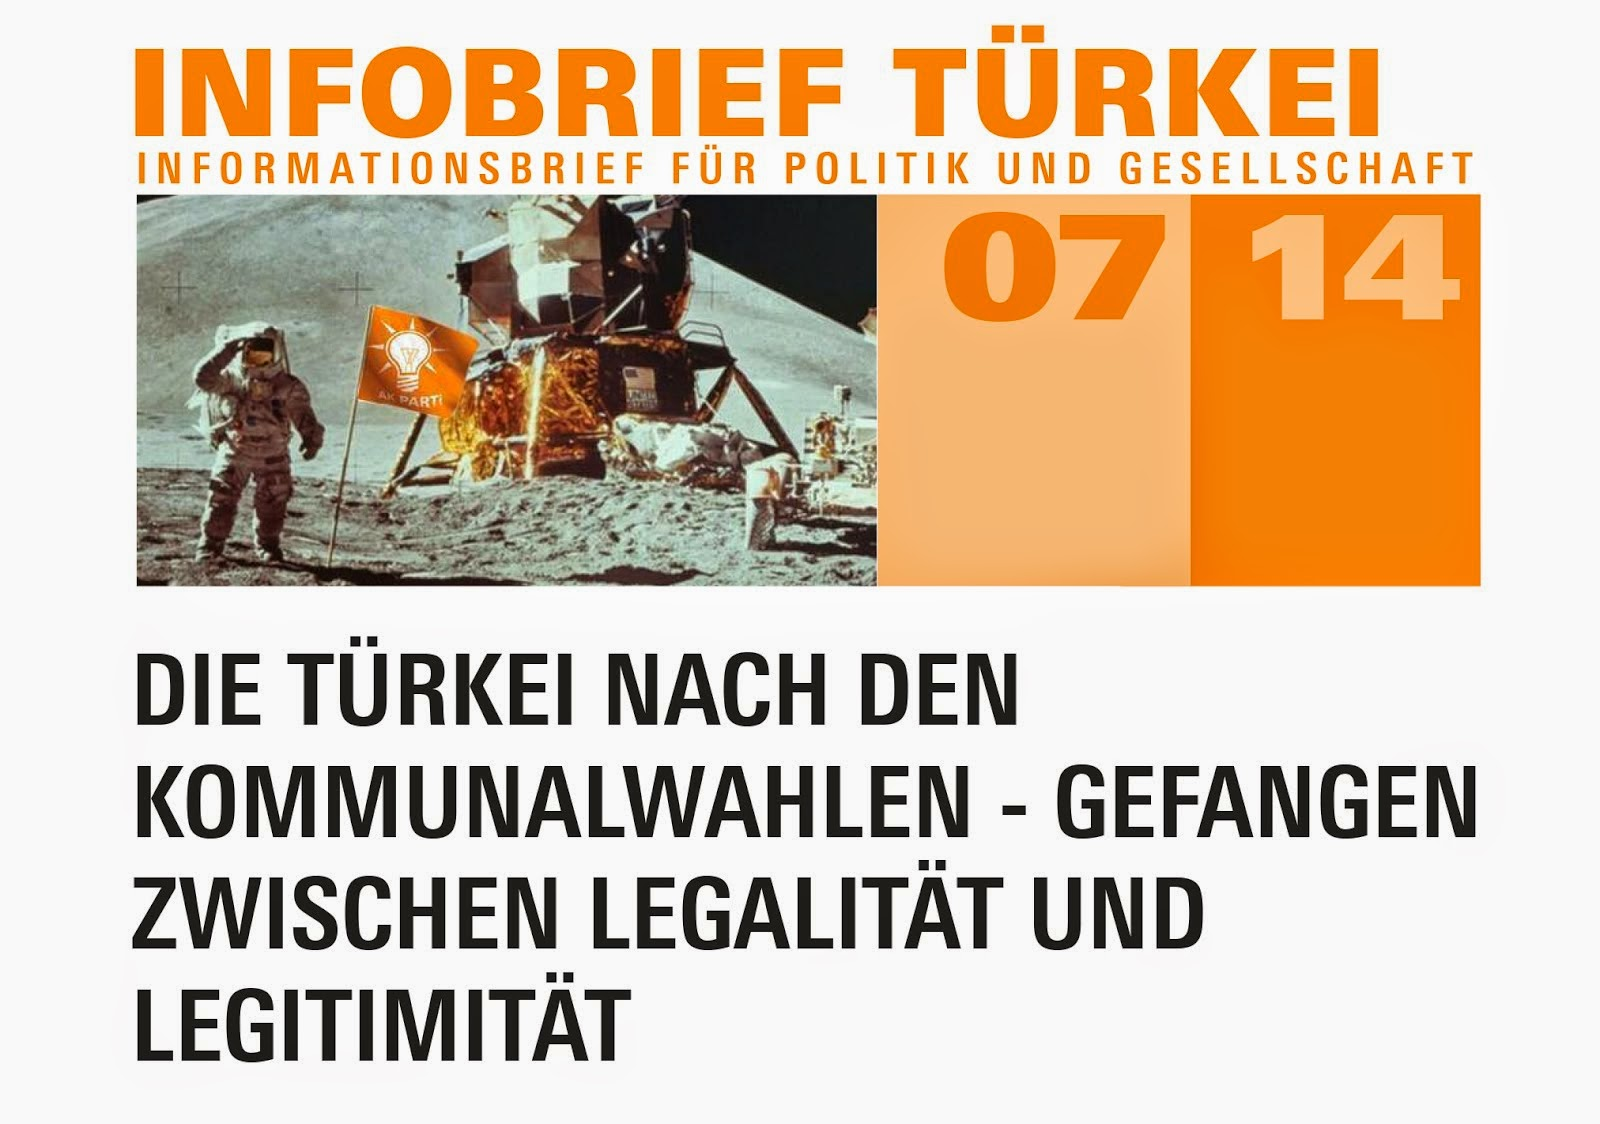 Infobrief Türkei 07/2014